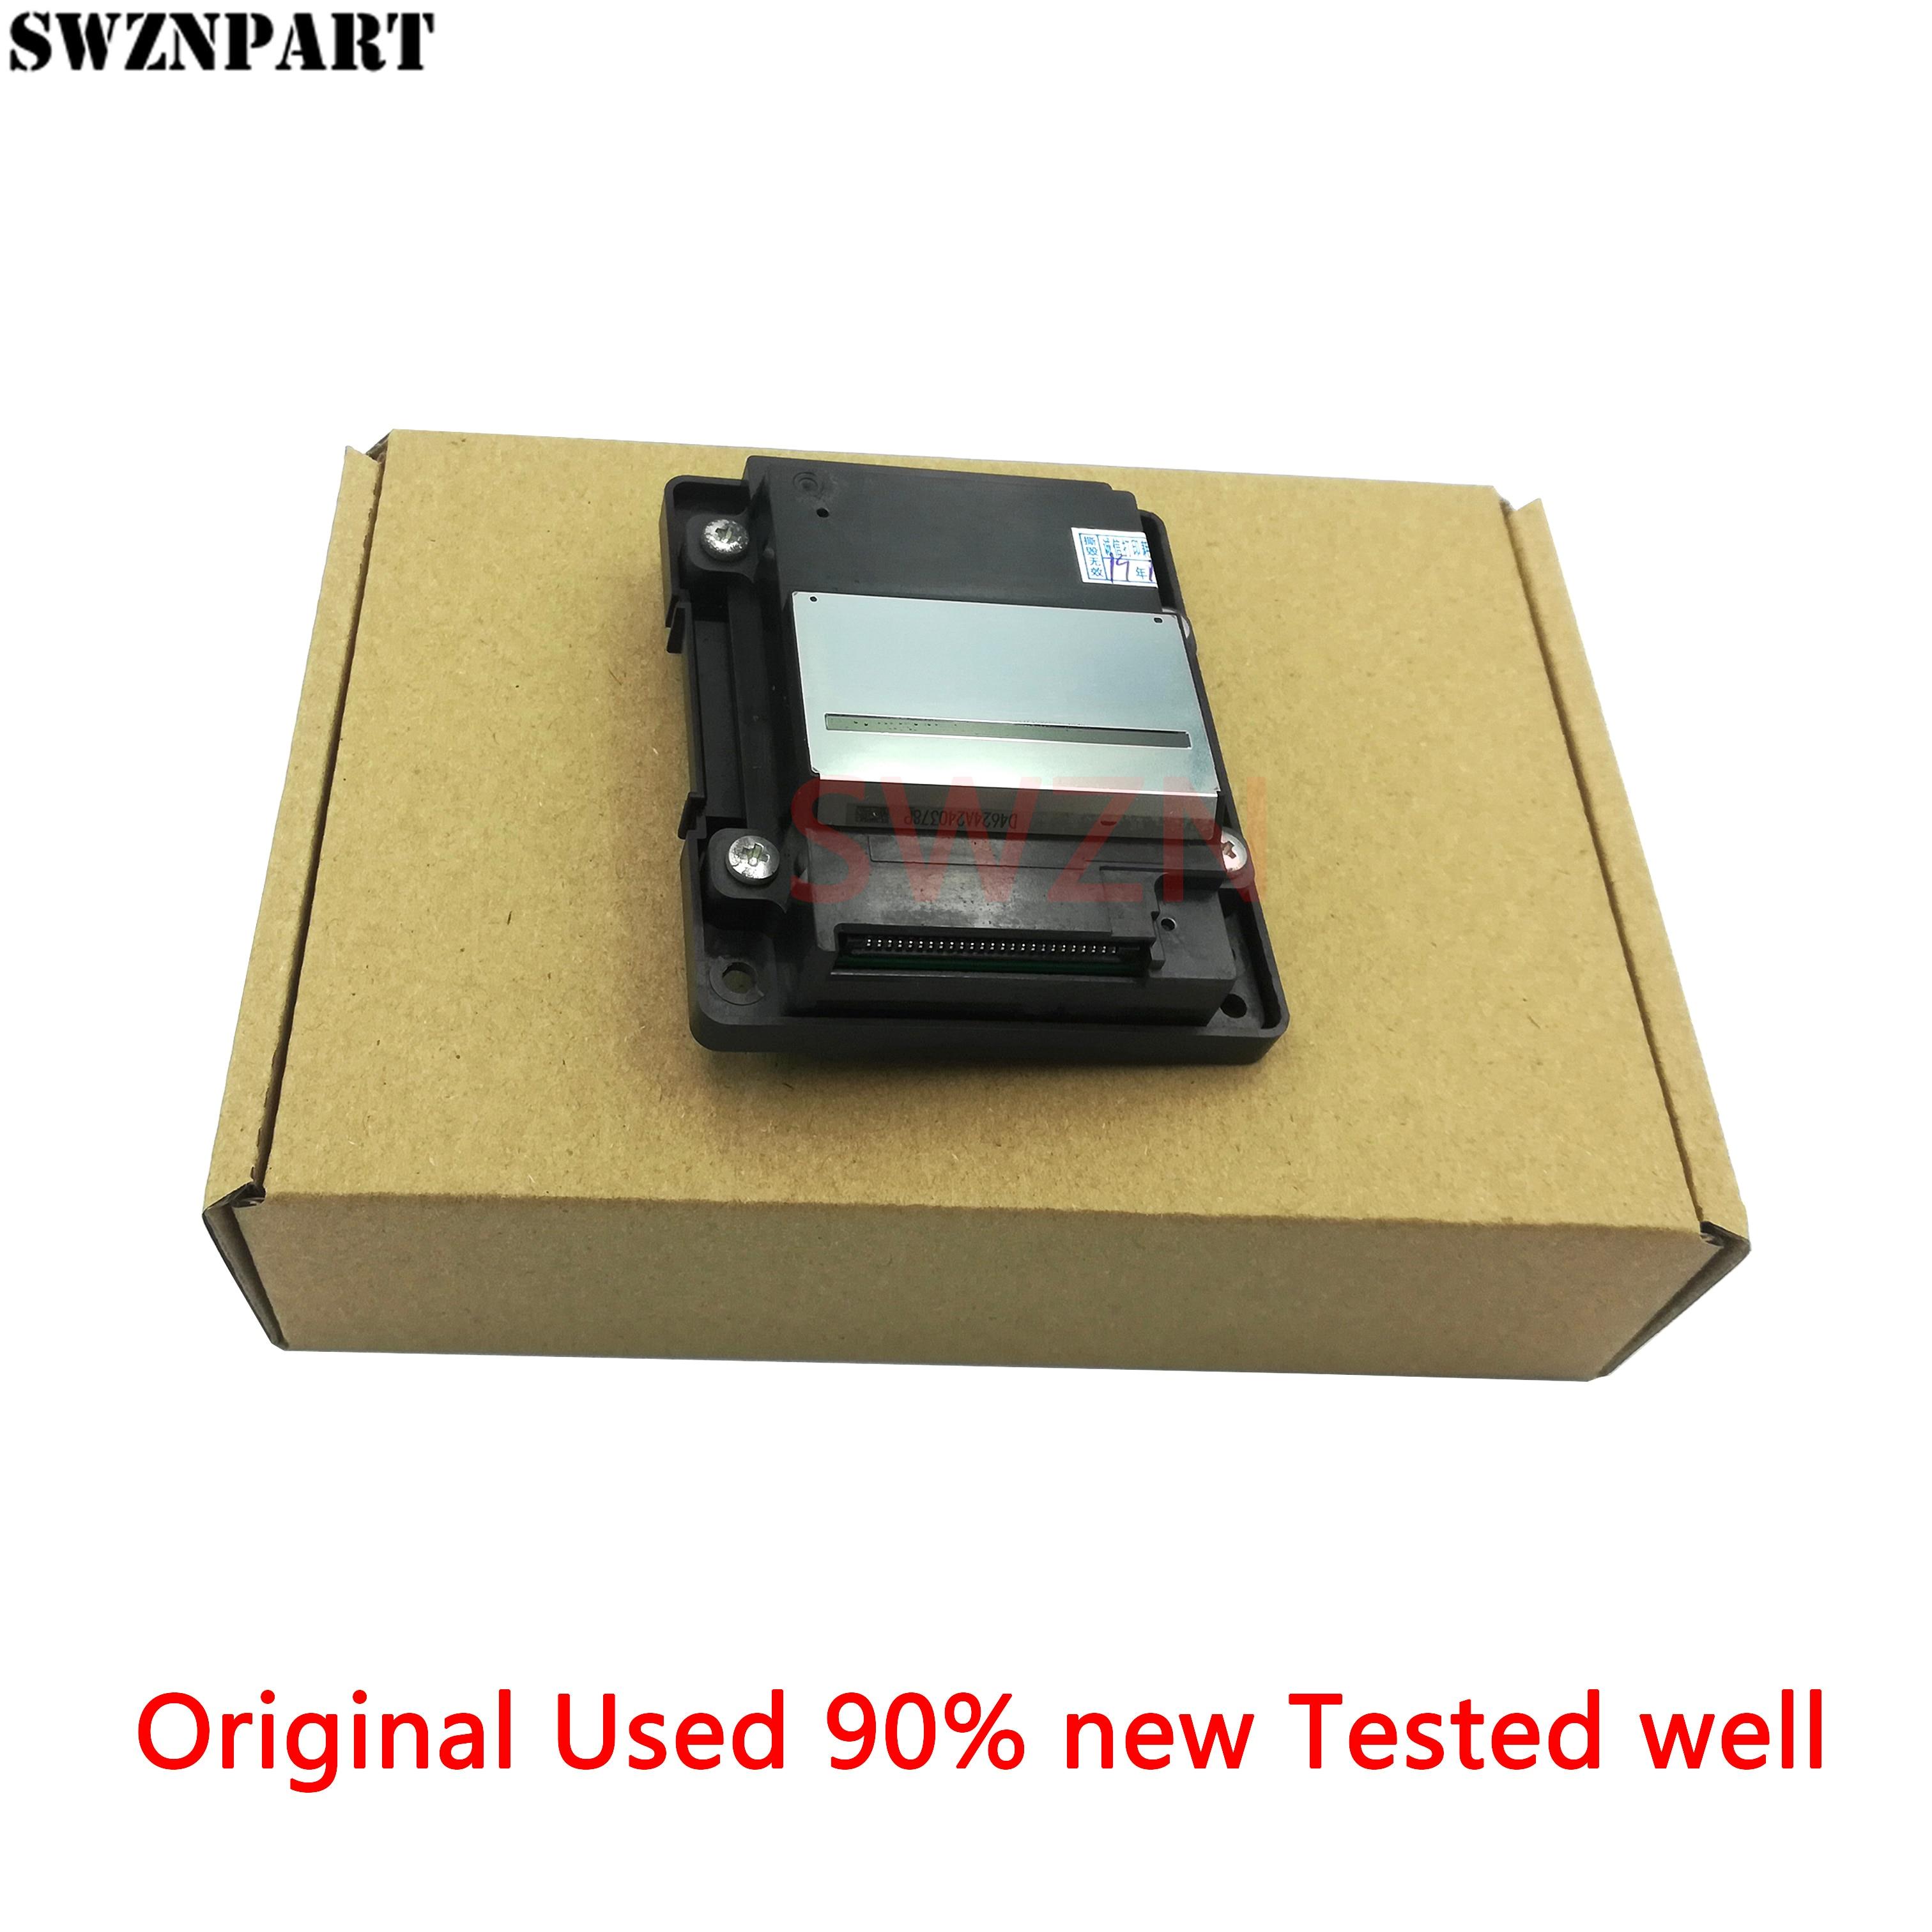 Printhead Printer Print Head for Epson WF 2650 WF 2651 WF 2660 WF 2661 WF 2750 WF2650 WF2651 WF2660 WF2661 WF2750 WF 2650 2660|Printer Parts| |  - title=